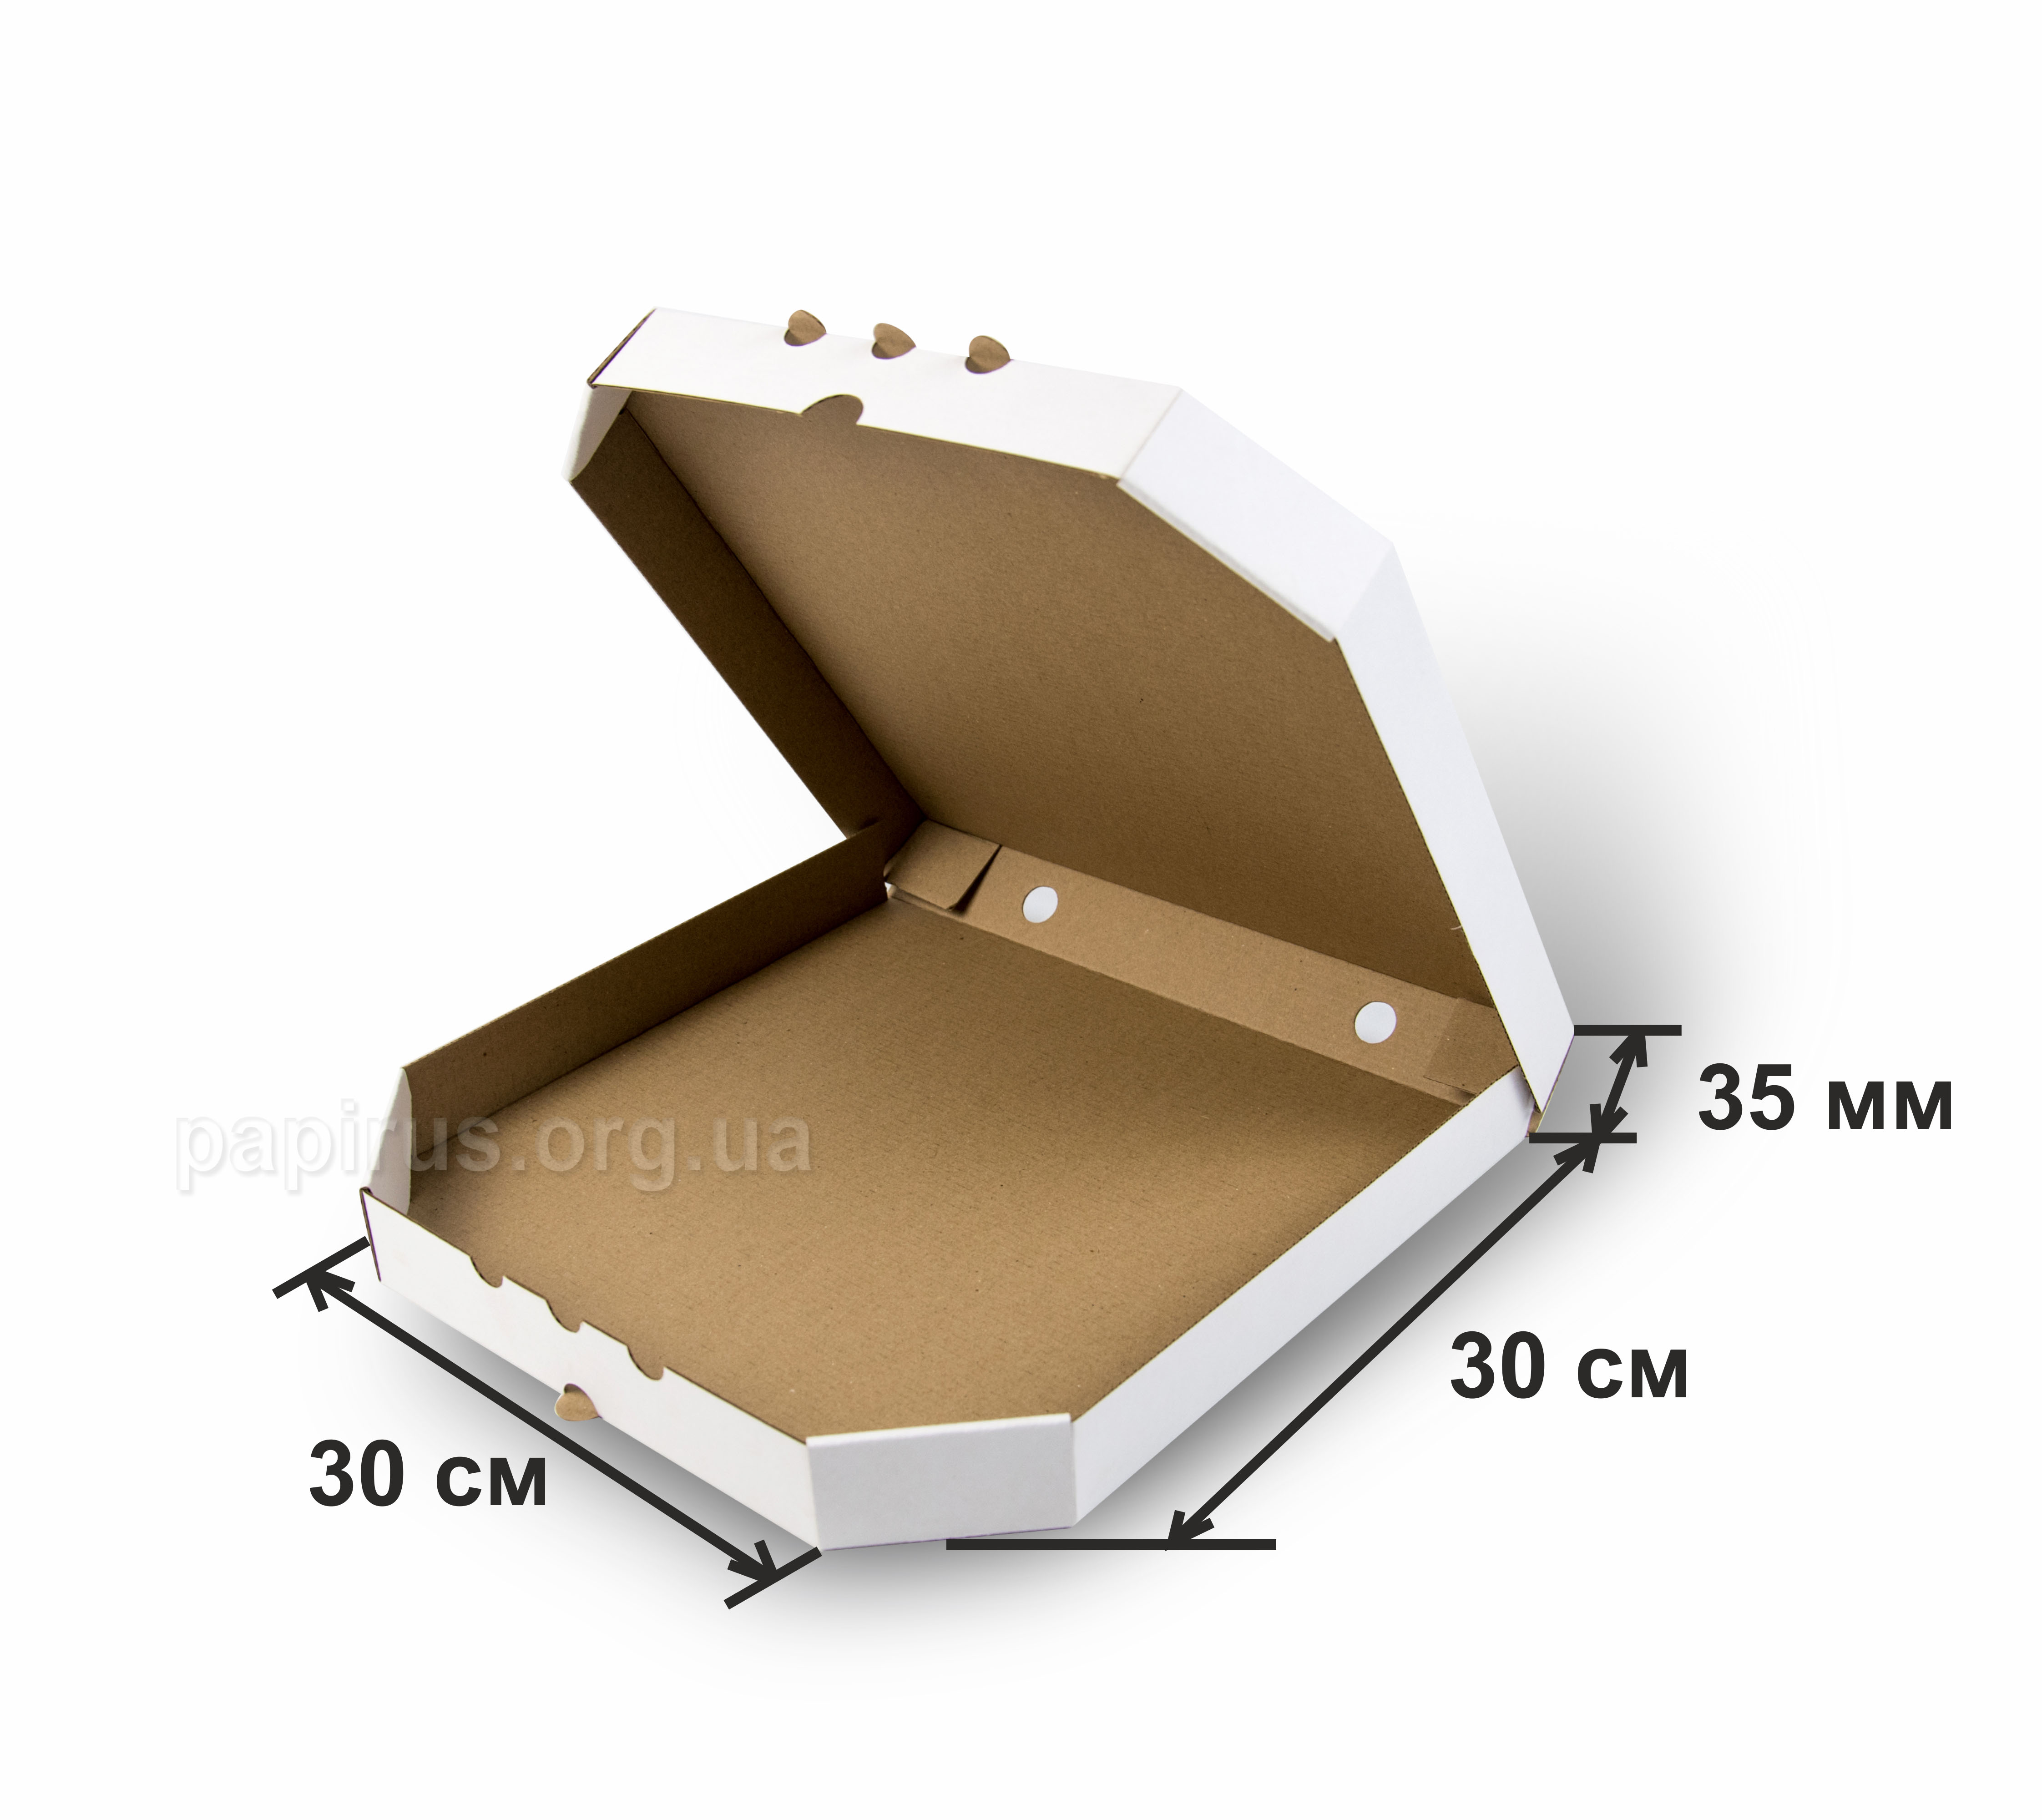 Коробка для пиццы белая 300х300, г.Сумы, Типография Папирус